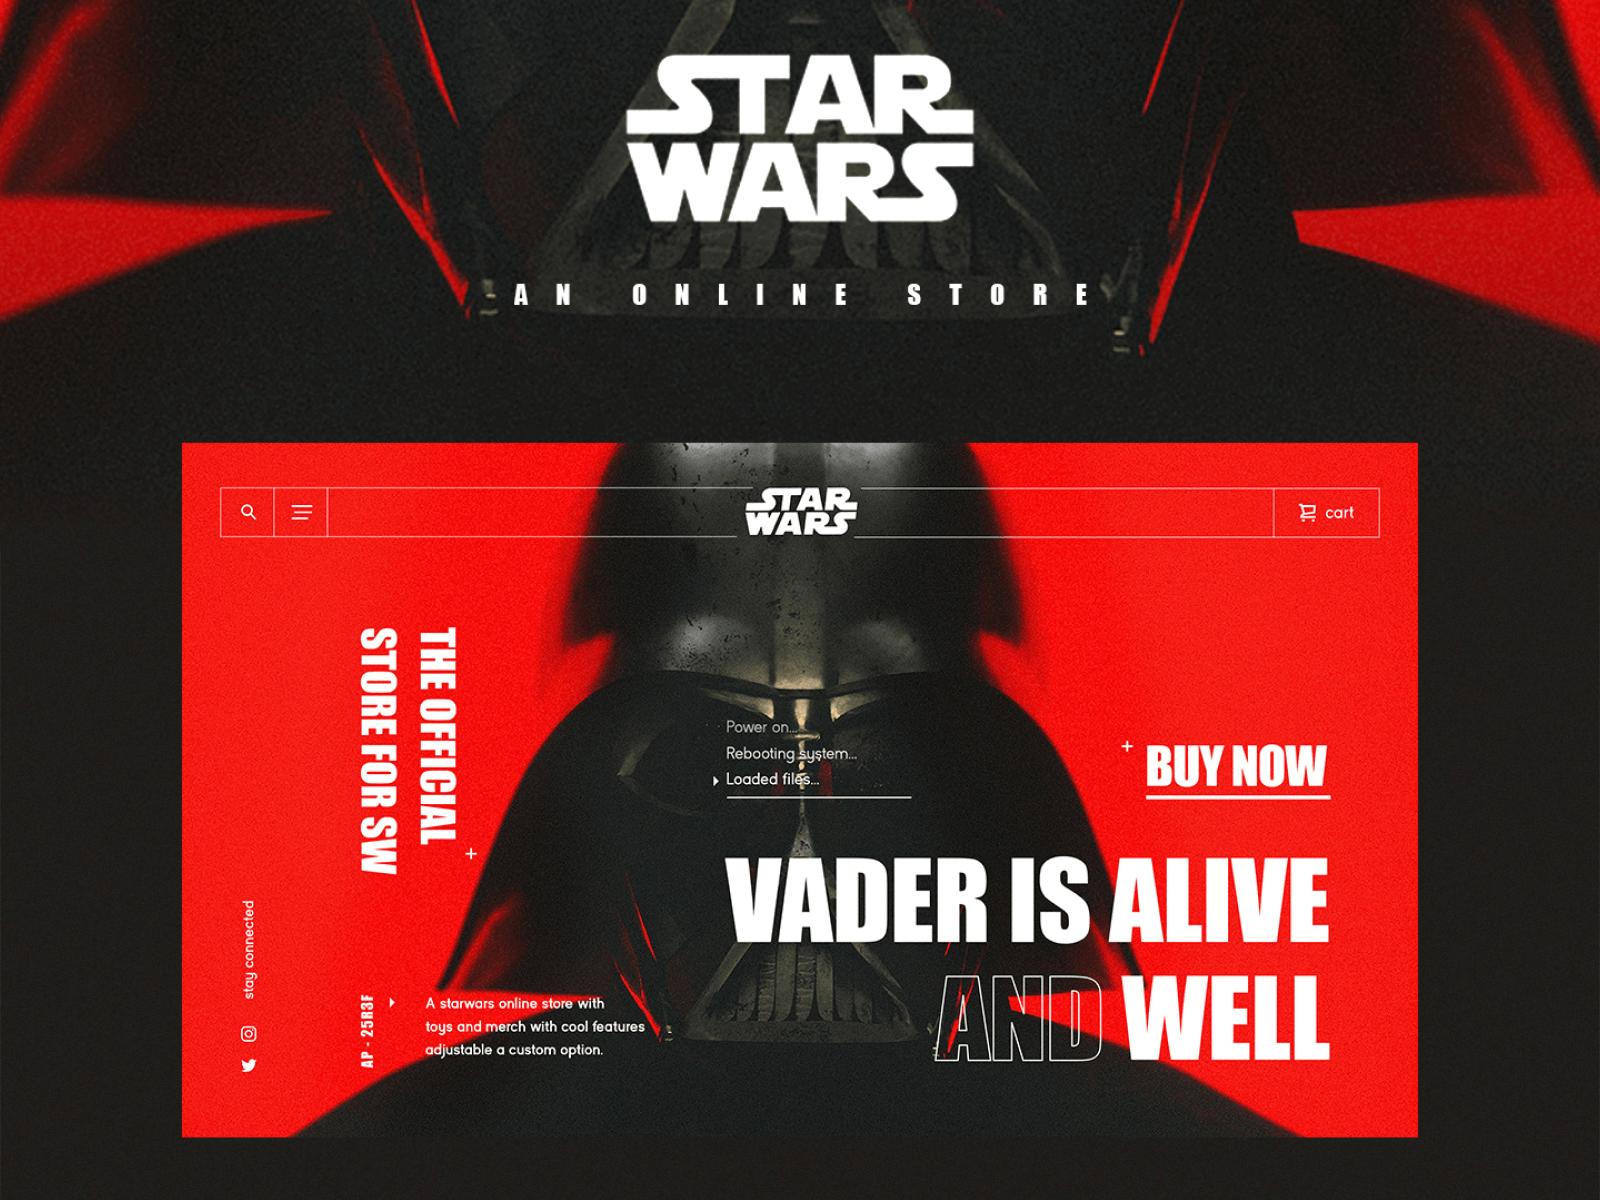 Star Wars online store concept